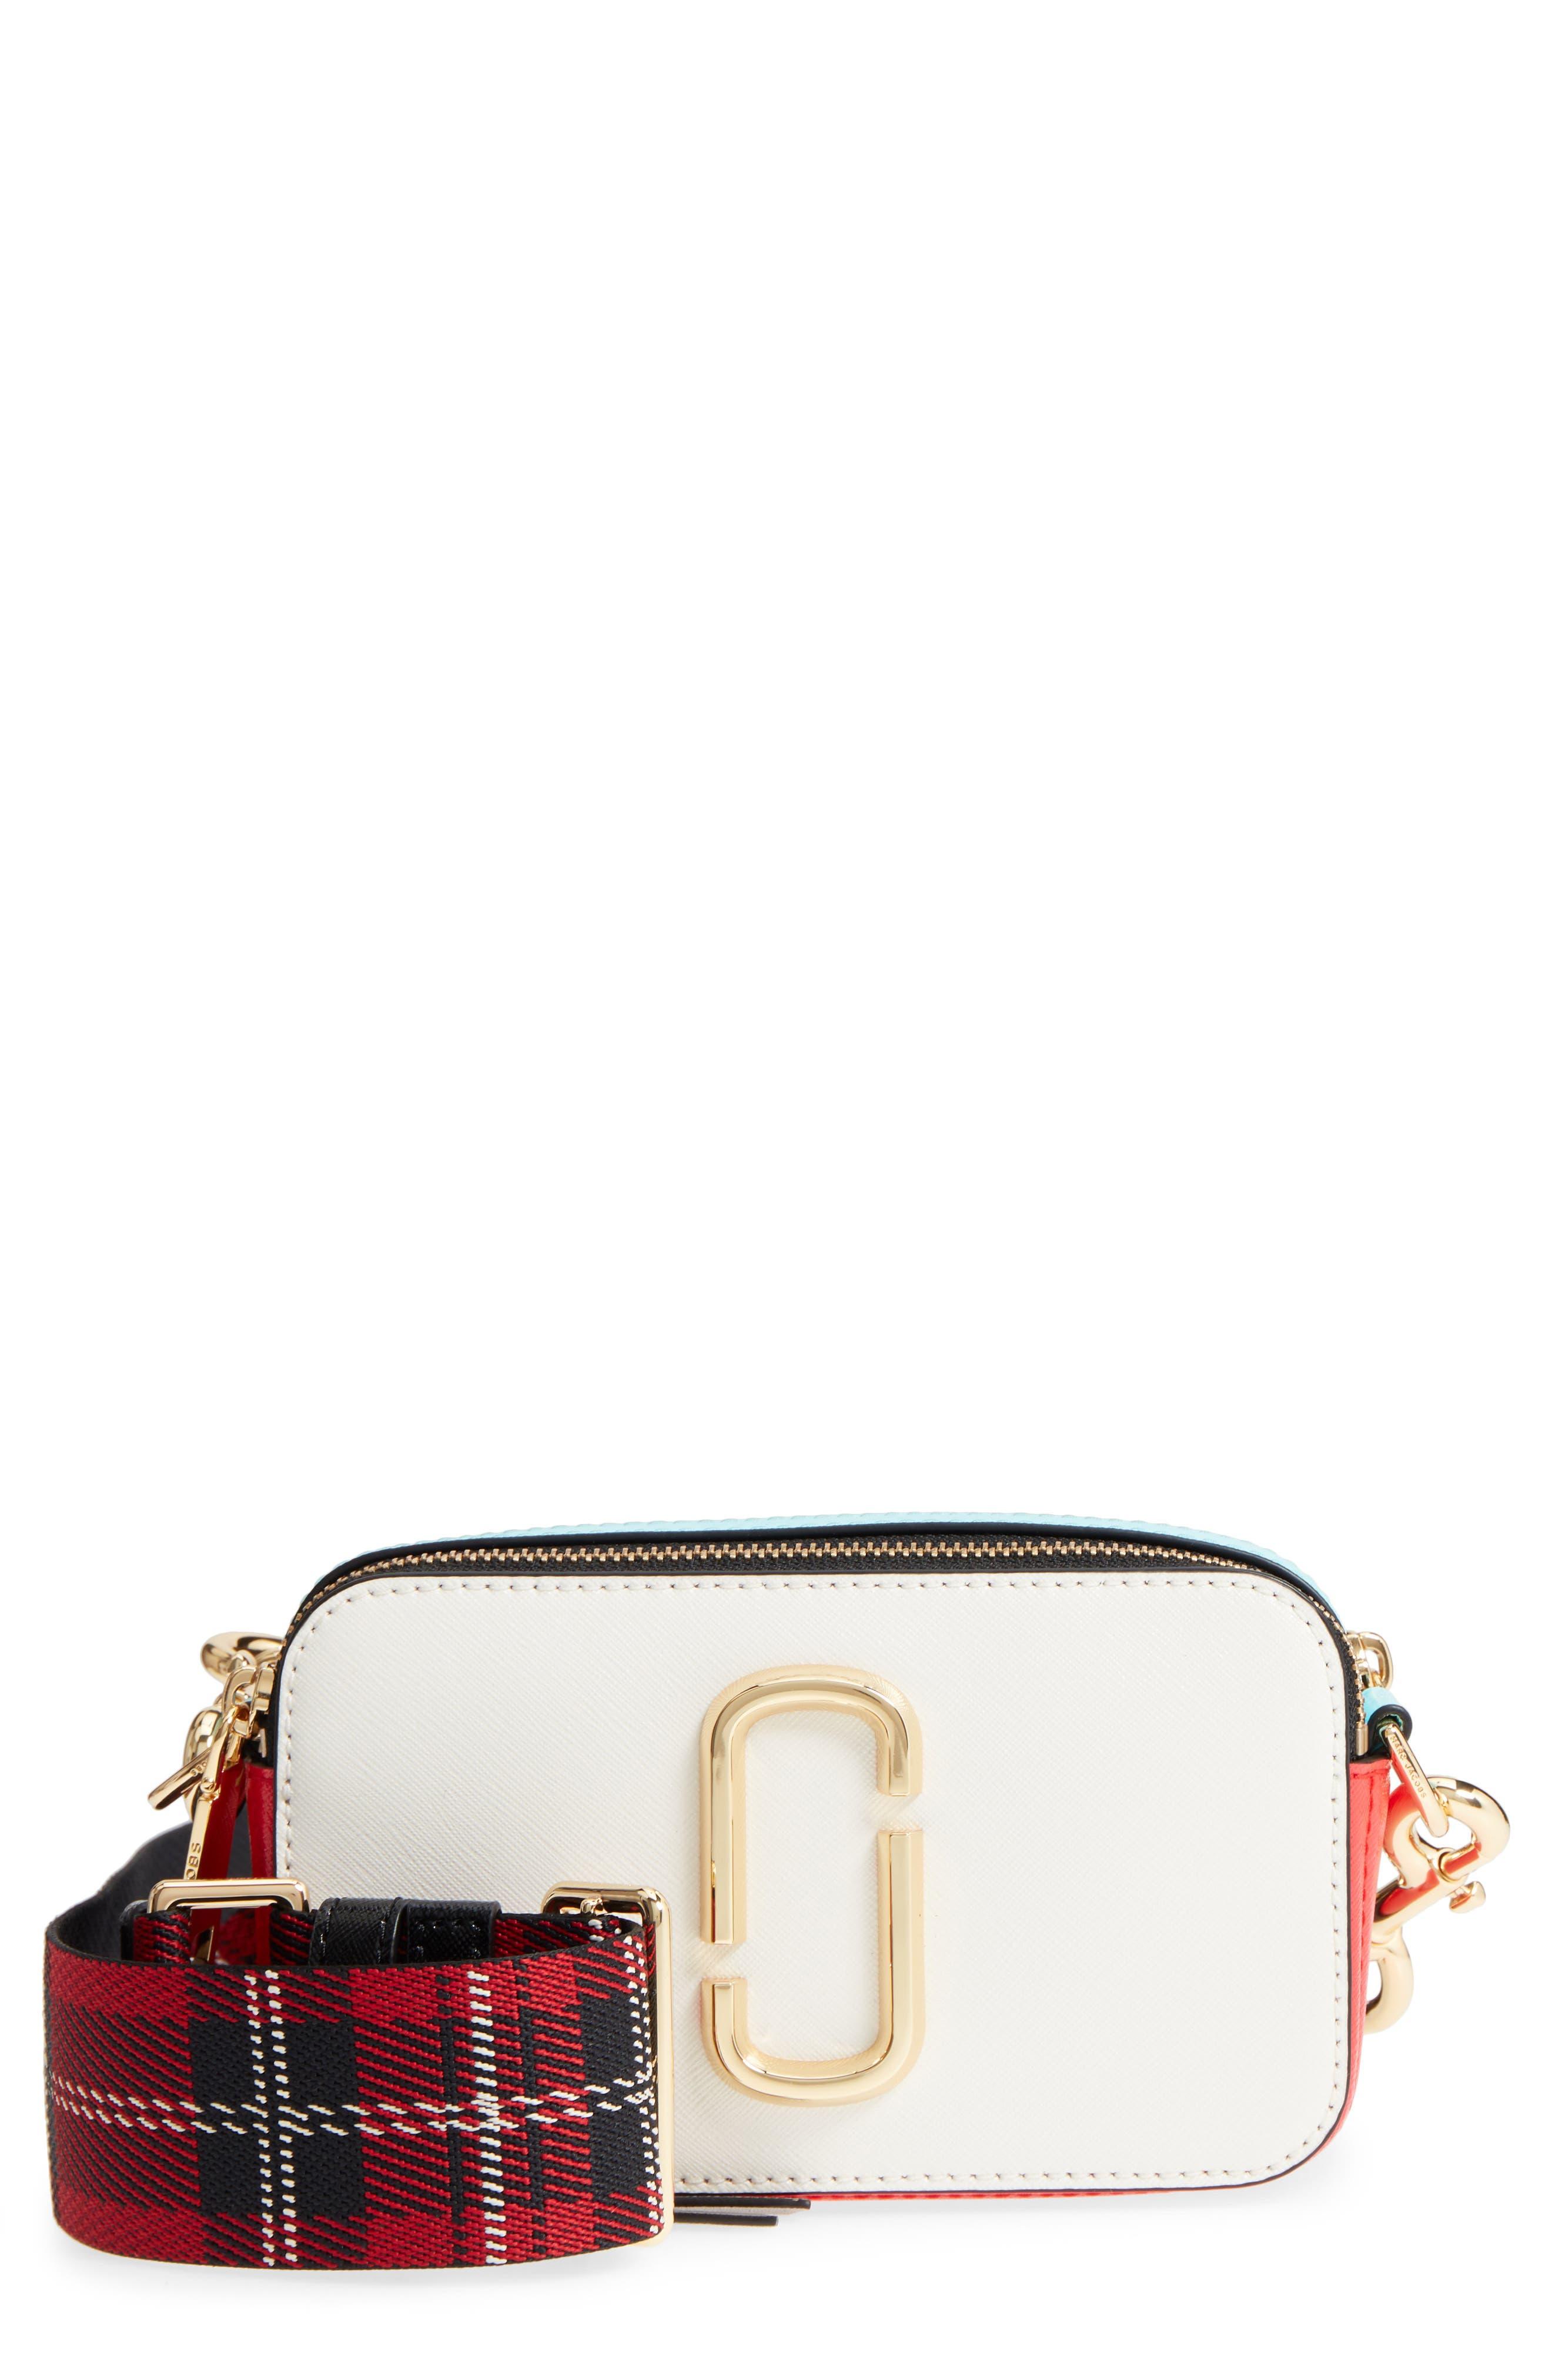 Snapshot Crossbody Bag,                             Main thumbnail 1, color,                             Porcelain Multi